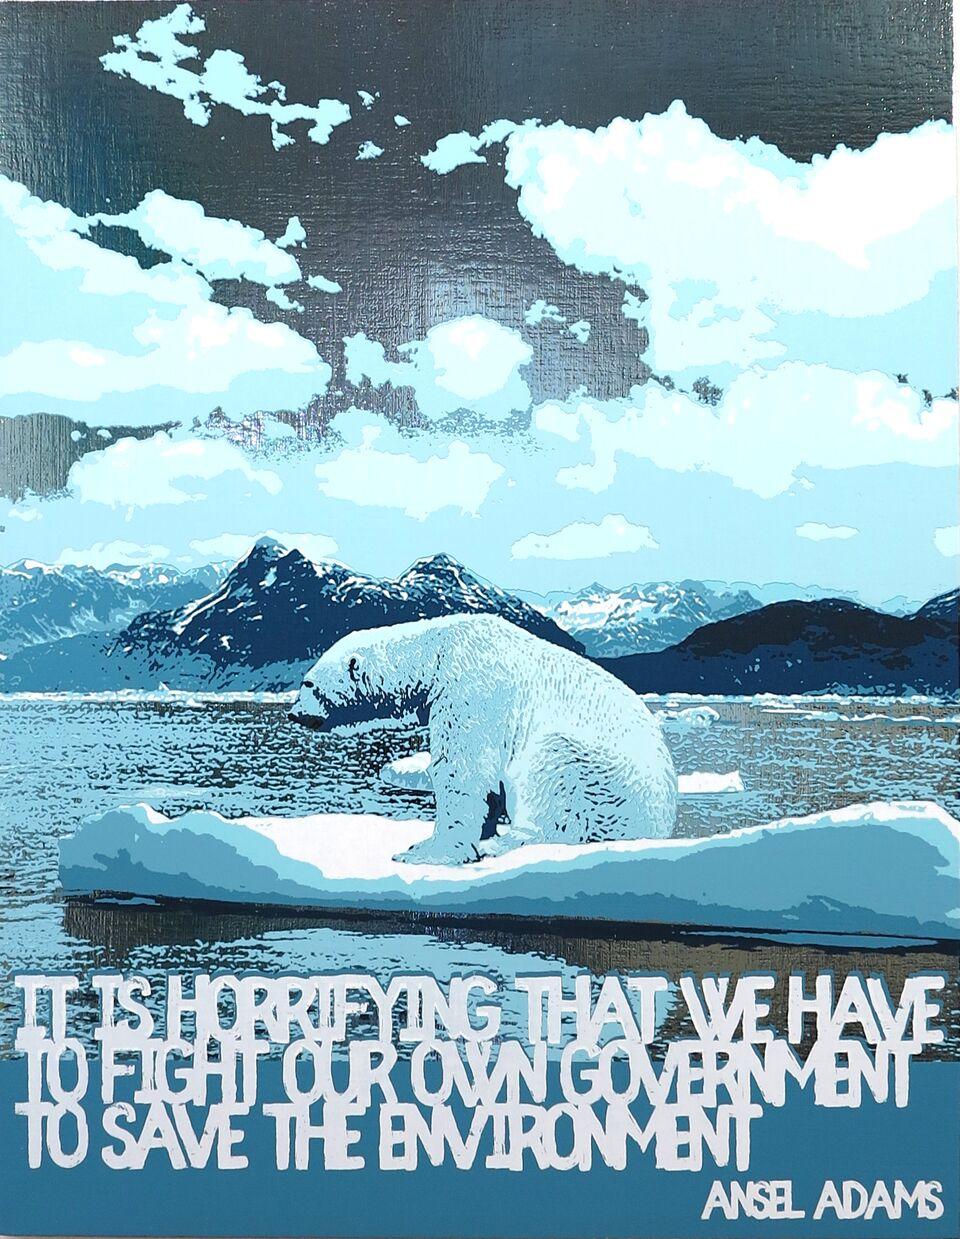 Polar Bear/Global Warming (Ansel Adams)